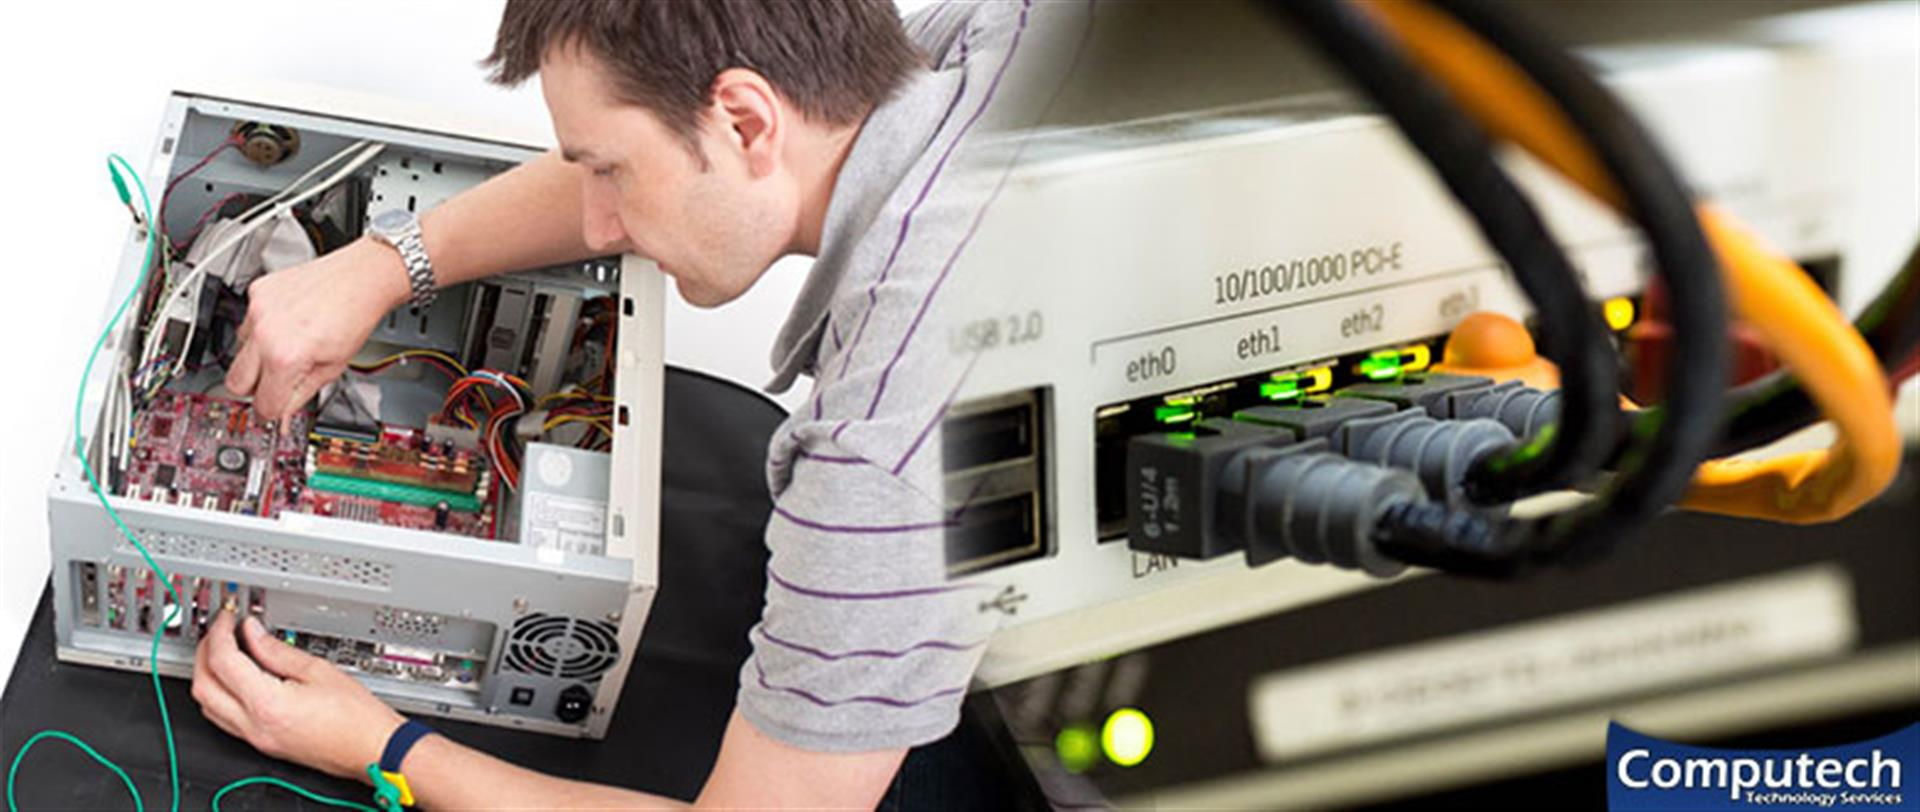 Foley Alabama On-Site Computer PC & Printer Repair, Network, Telecom & Data Wiring Services